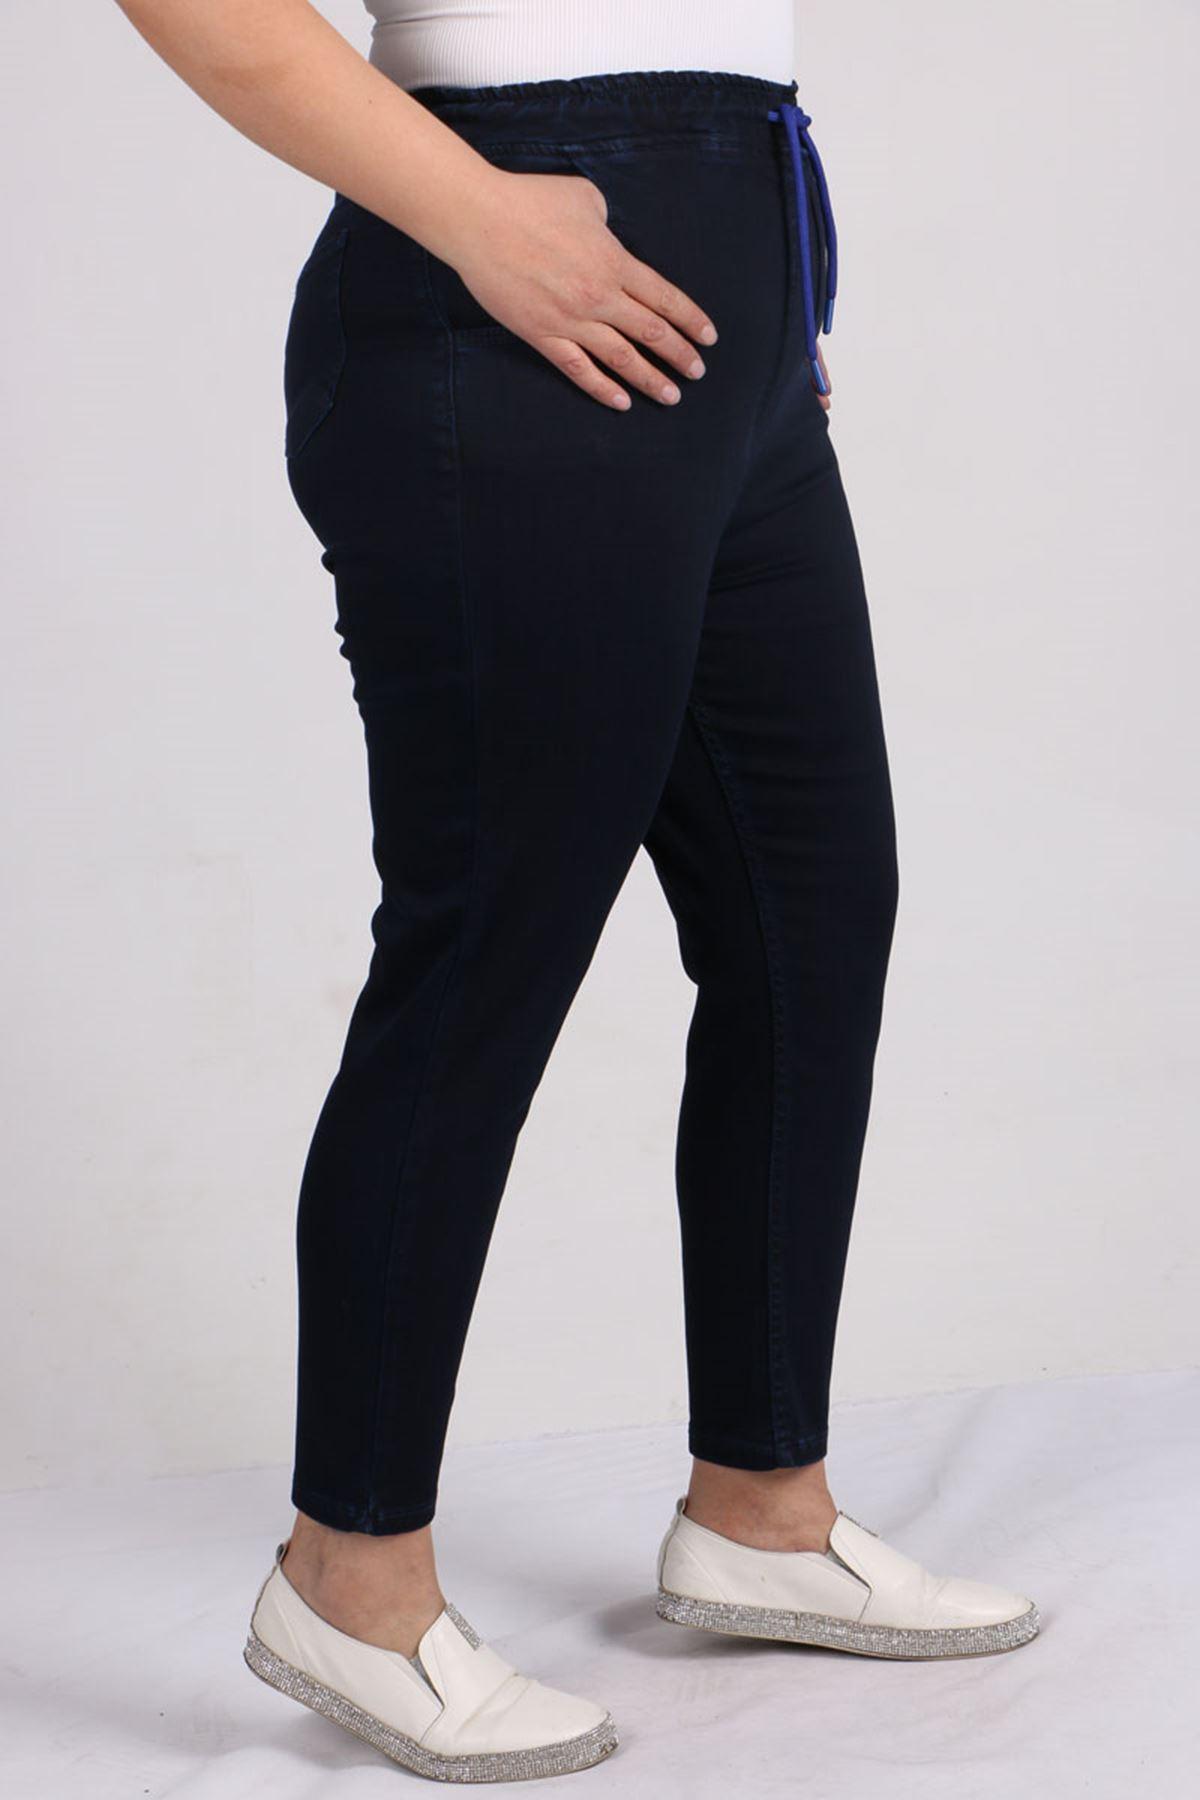 9136 Plus Size Elastic Waist Mom Jeans- Dark Navy Blue - Saxe